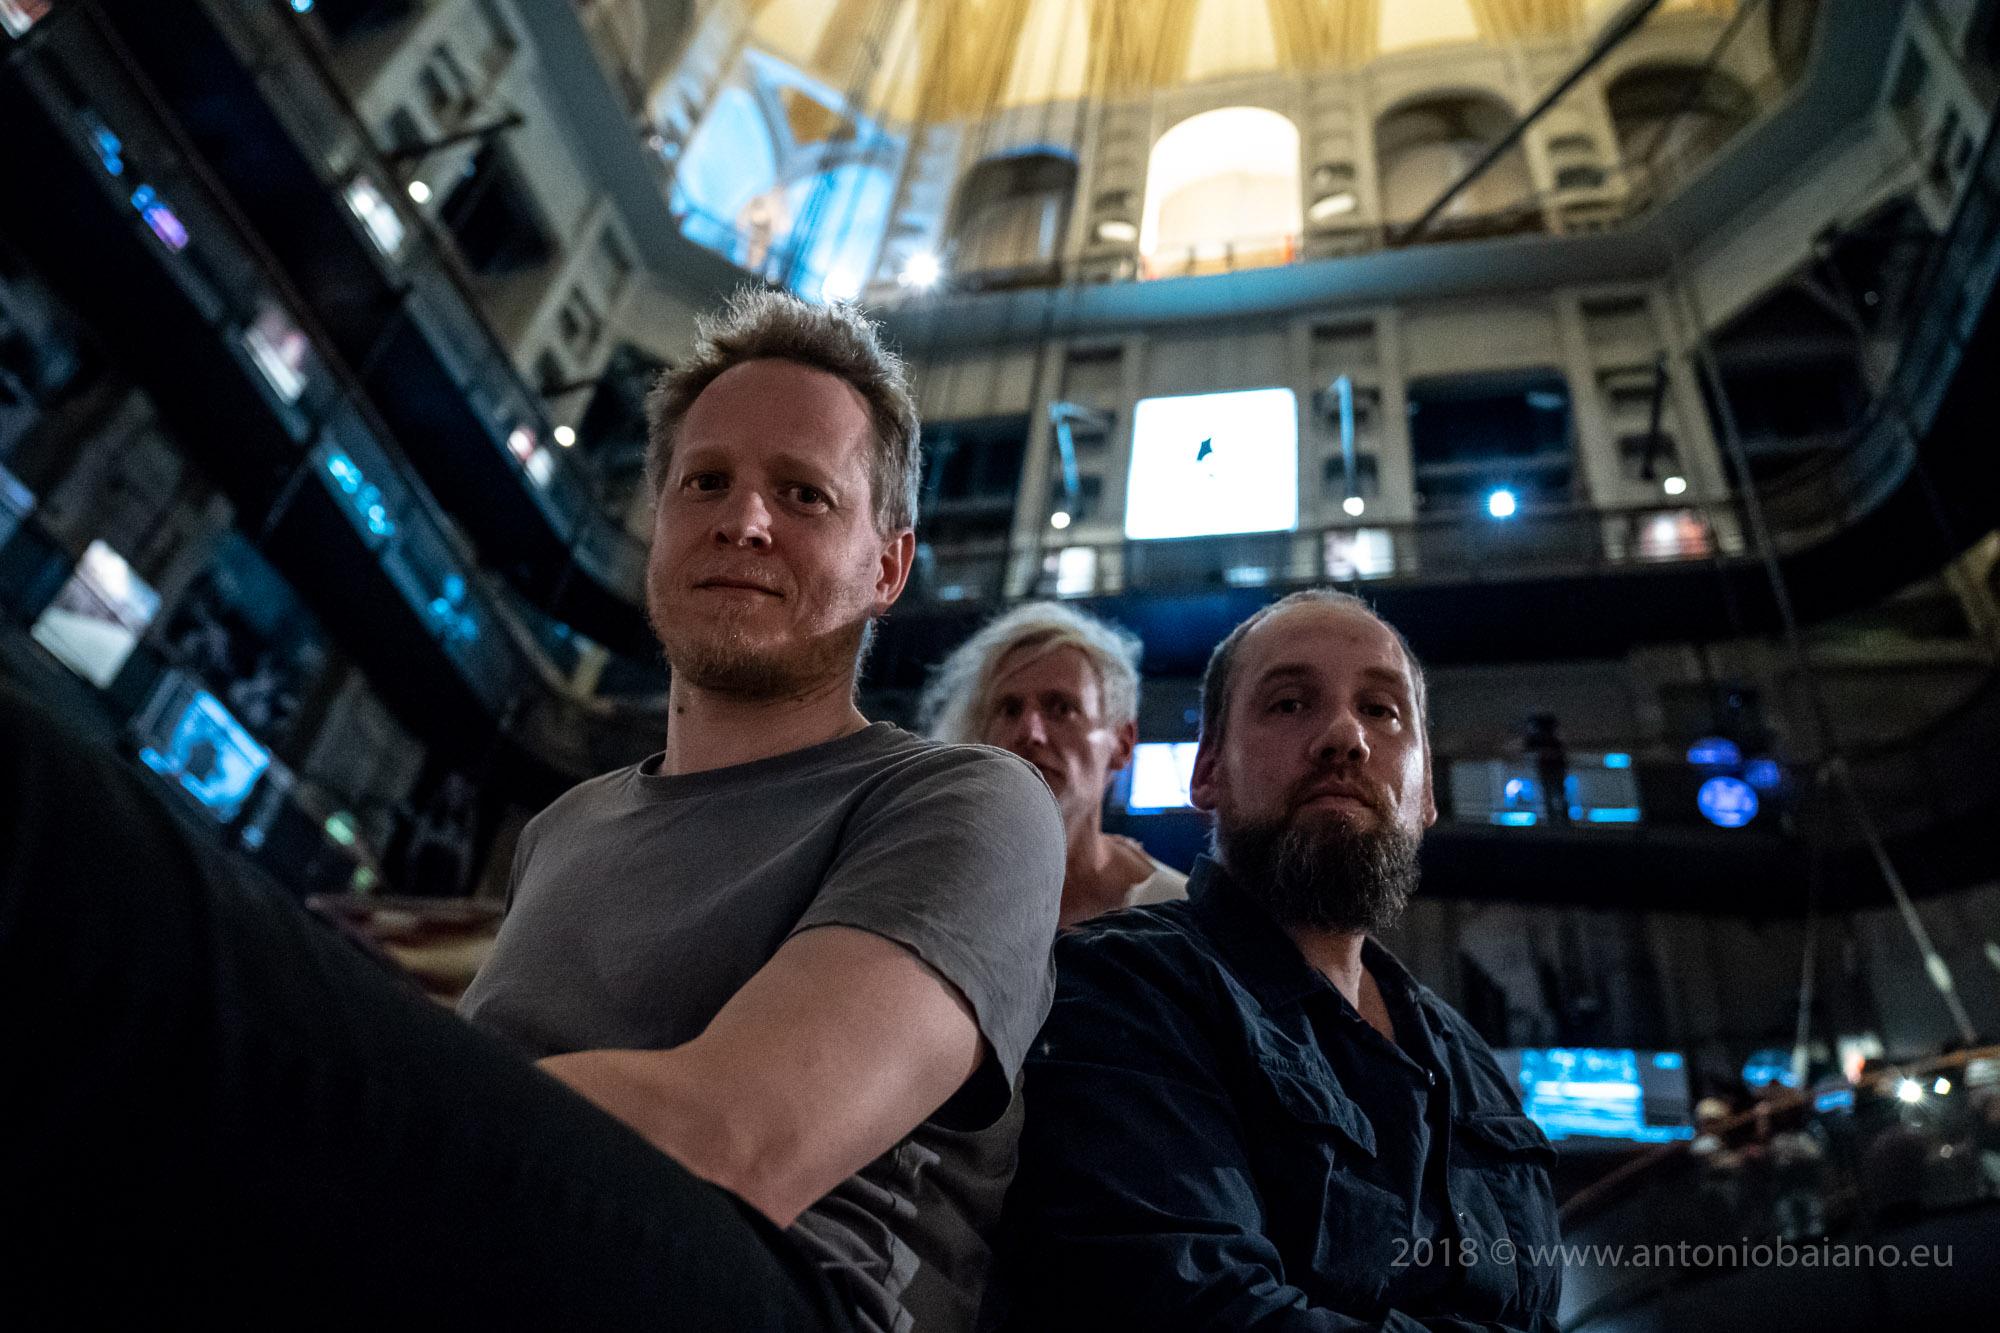 Martin Brandlmayr, John Norman, Martin Siewert (Radian) - TJF 2018